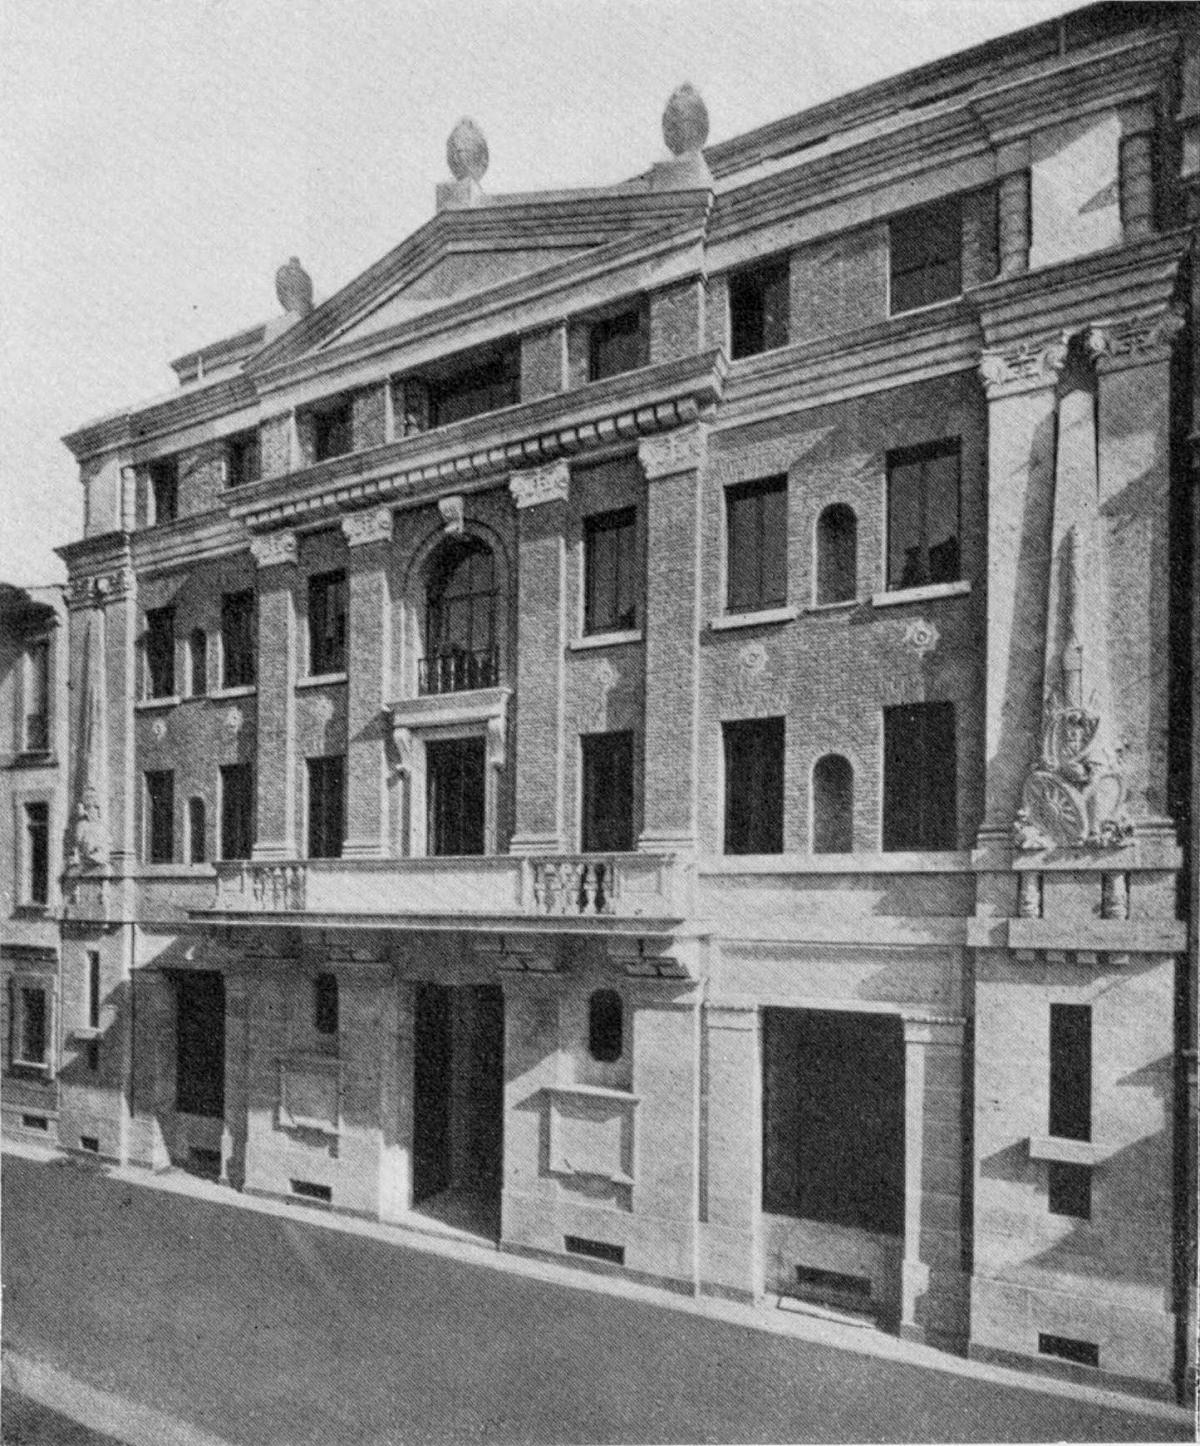 Casa dei fasci milanesi wikipedia for Piani casa dei caraibi